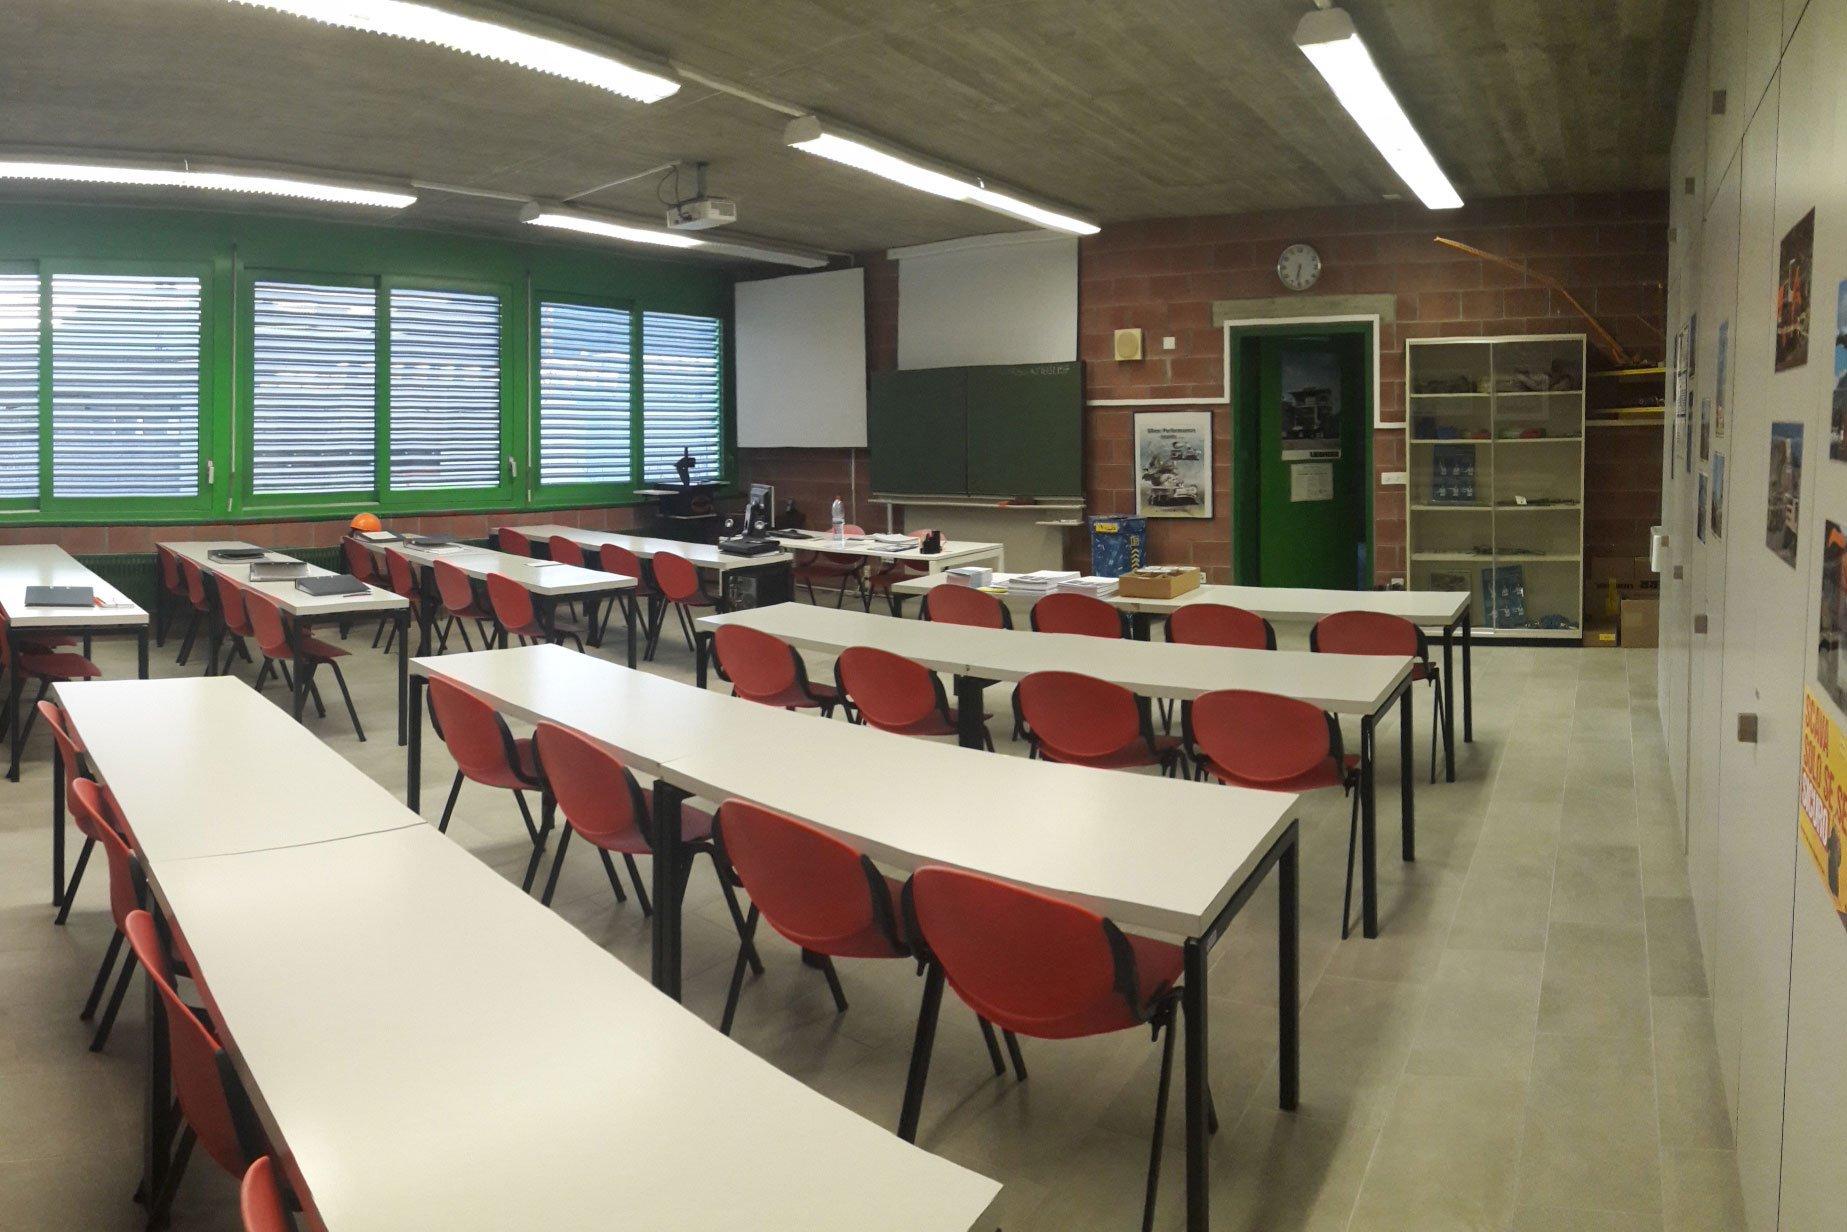 ssic-cfp-gordola-infrastrutture-aula-06